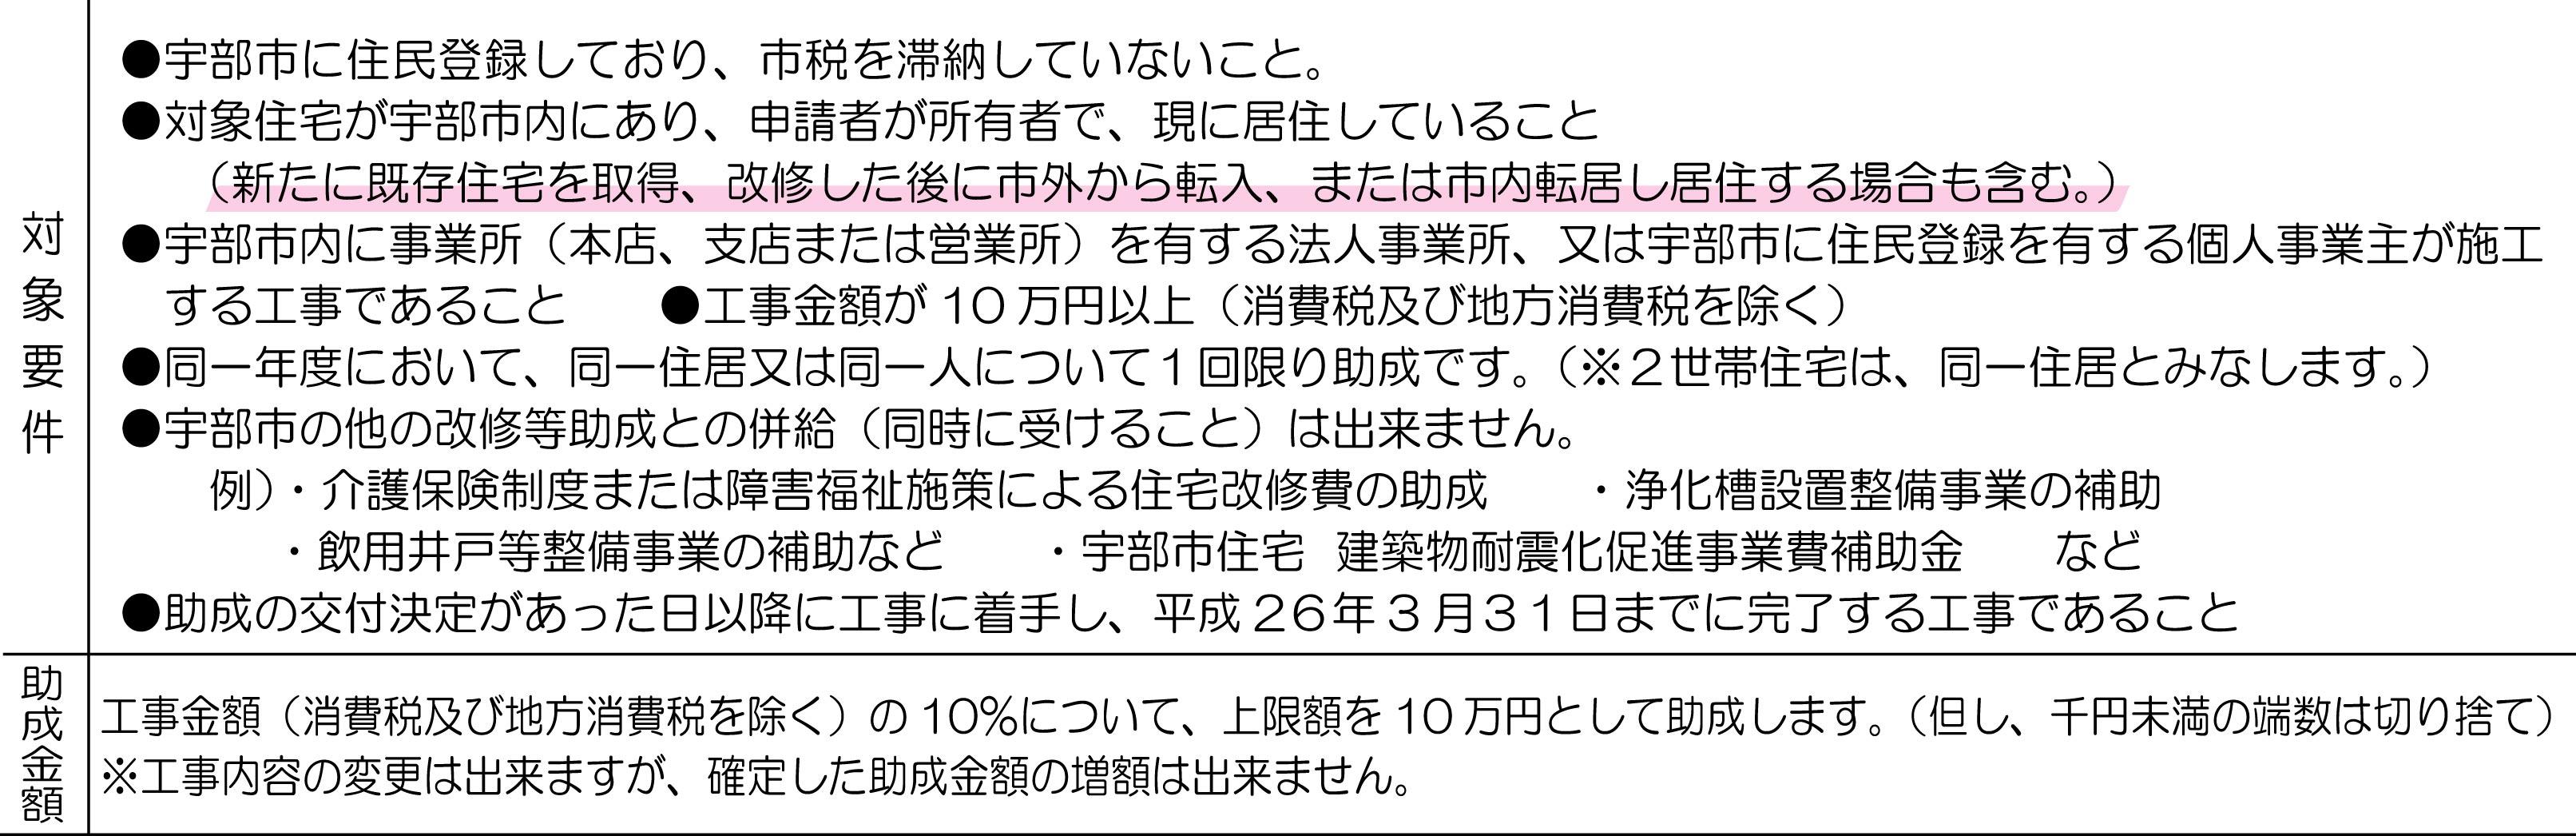 KuraSi-natu-sin73-15.5.jpg